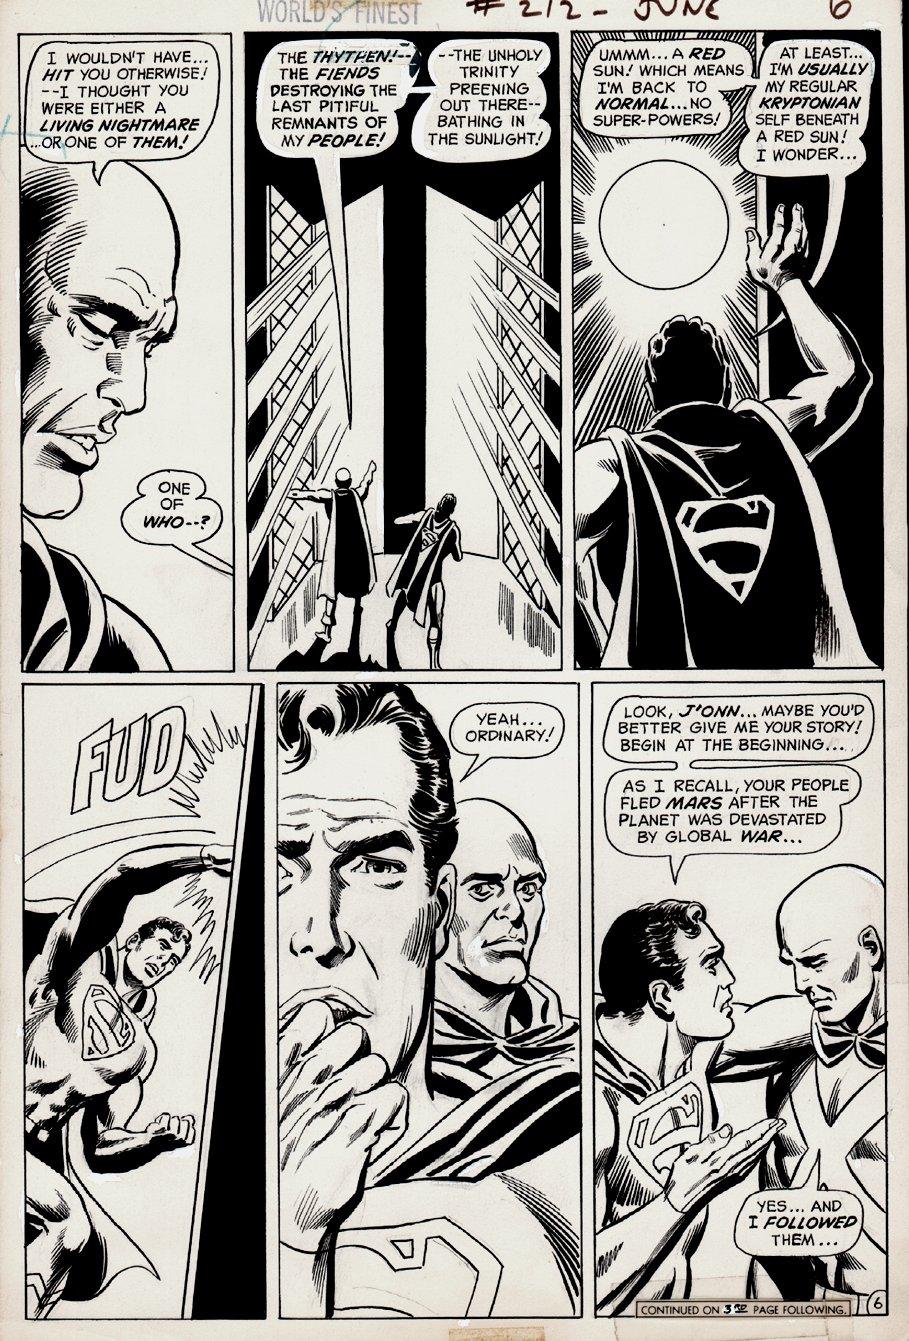 World's Finest Comics #212 p 6 (1972)